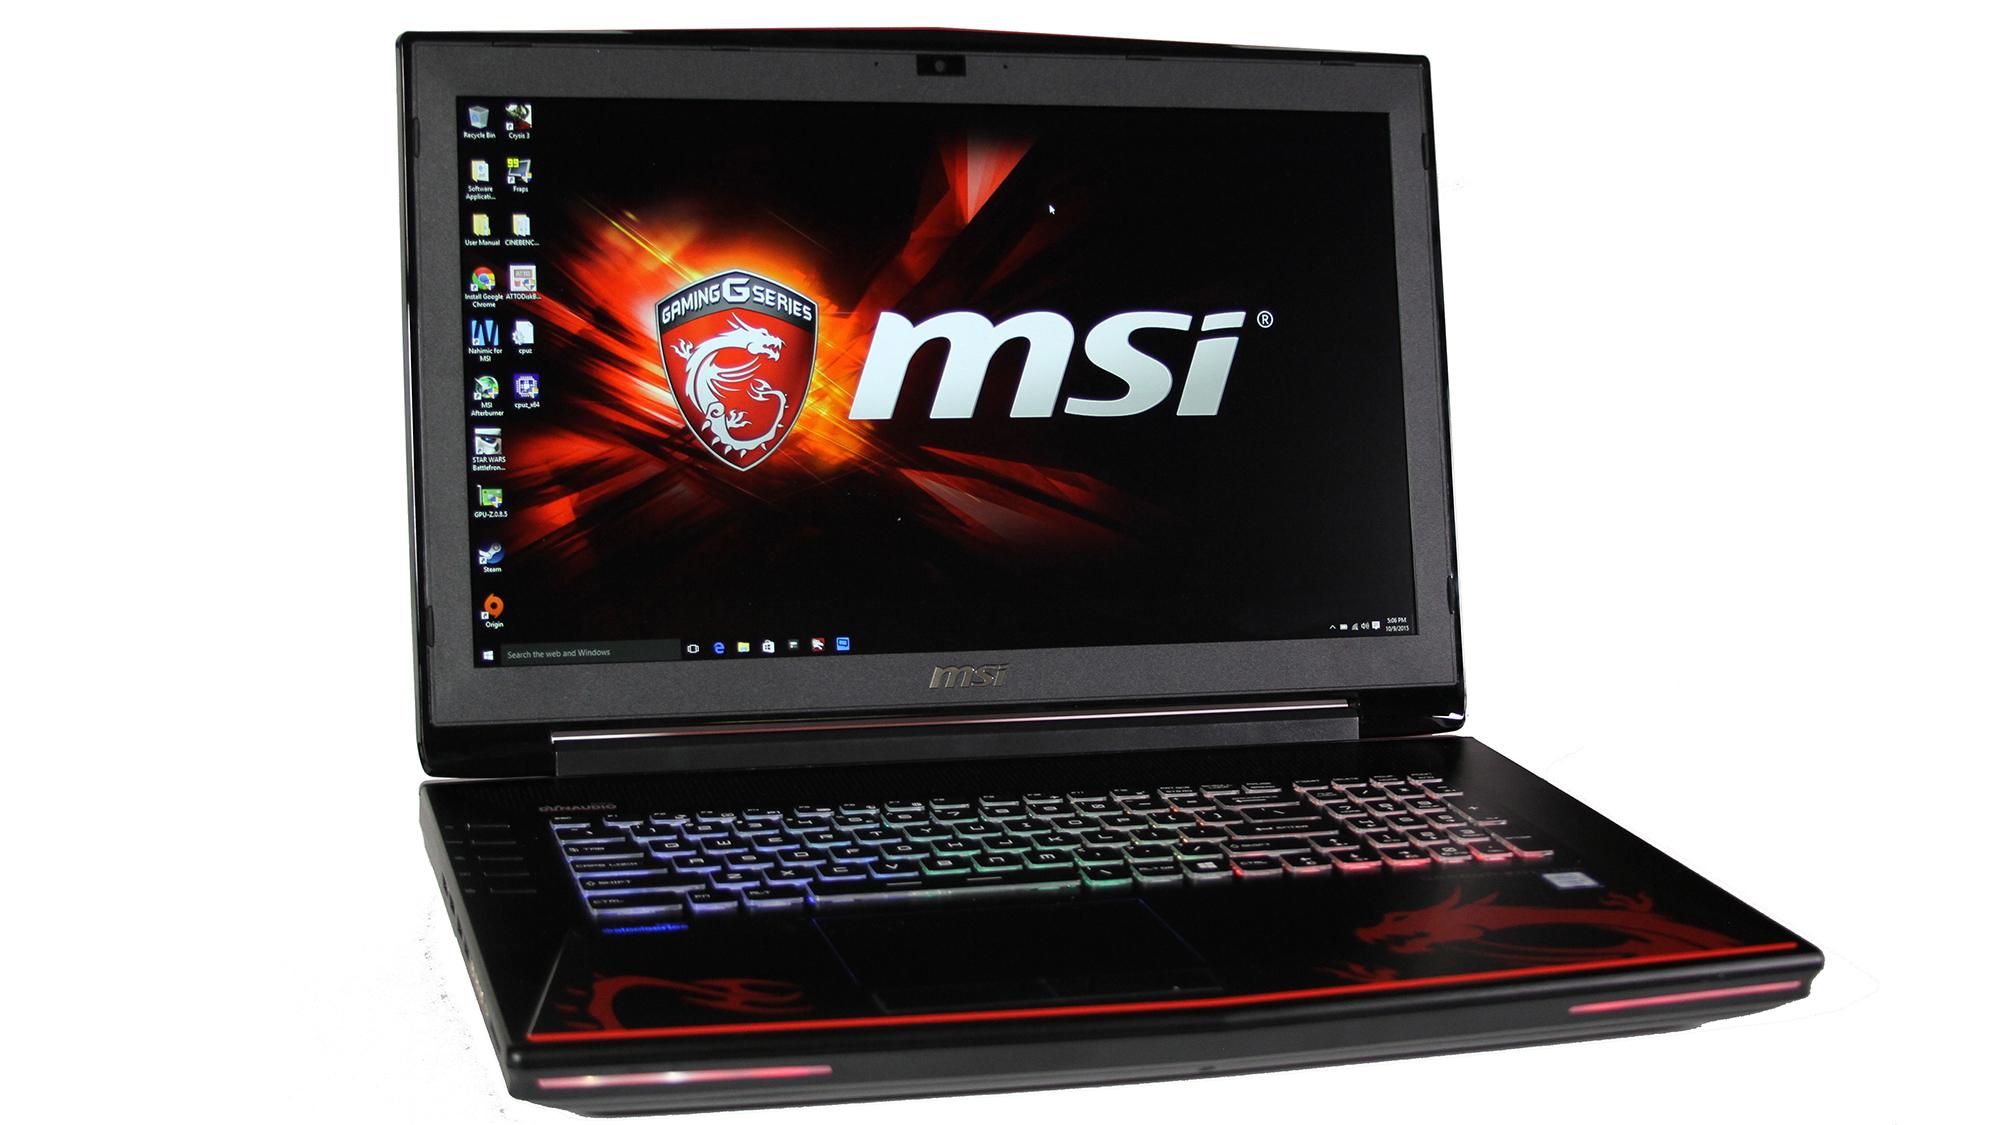 MSI GT72S Dominator Pro G Preview - Full GTX 980 Gaming